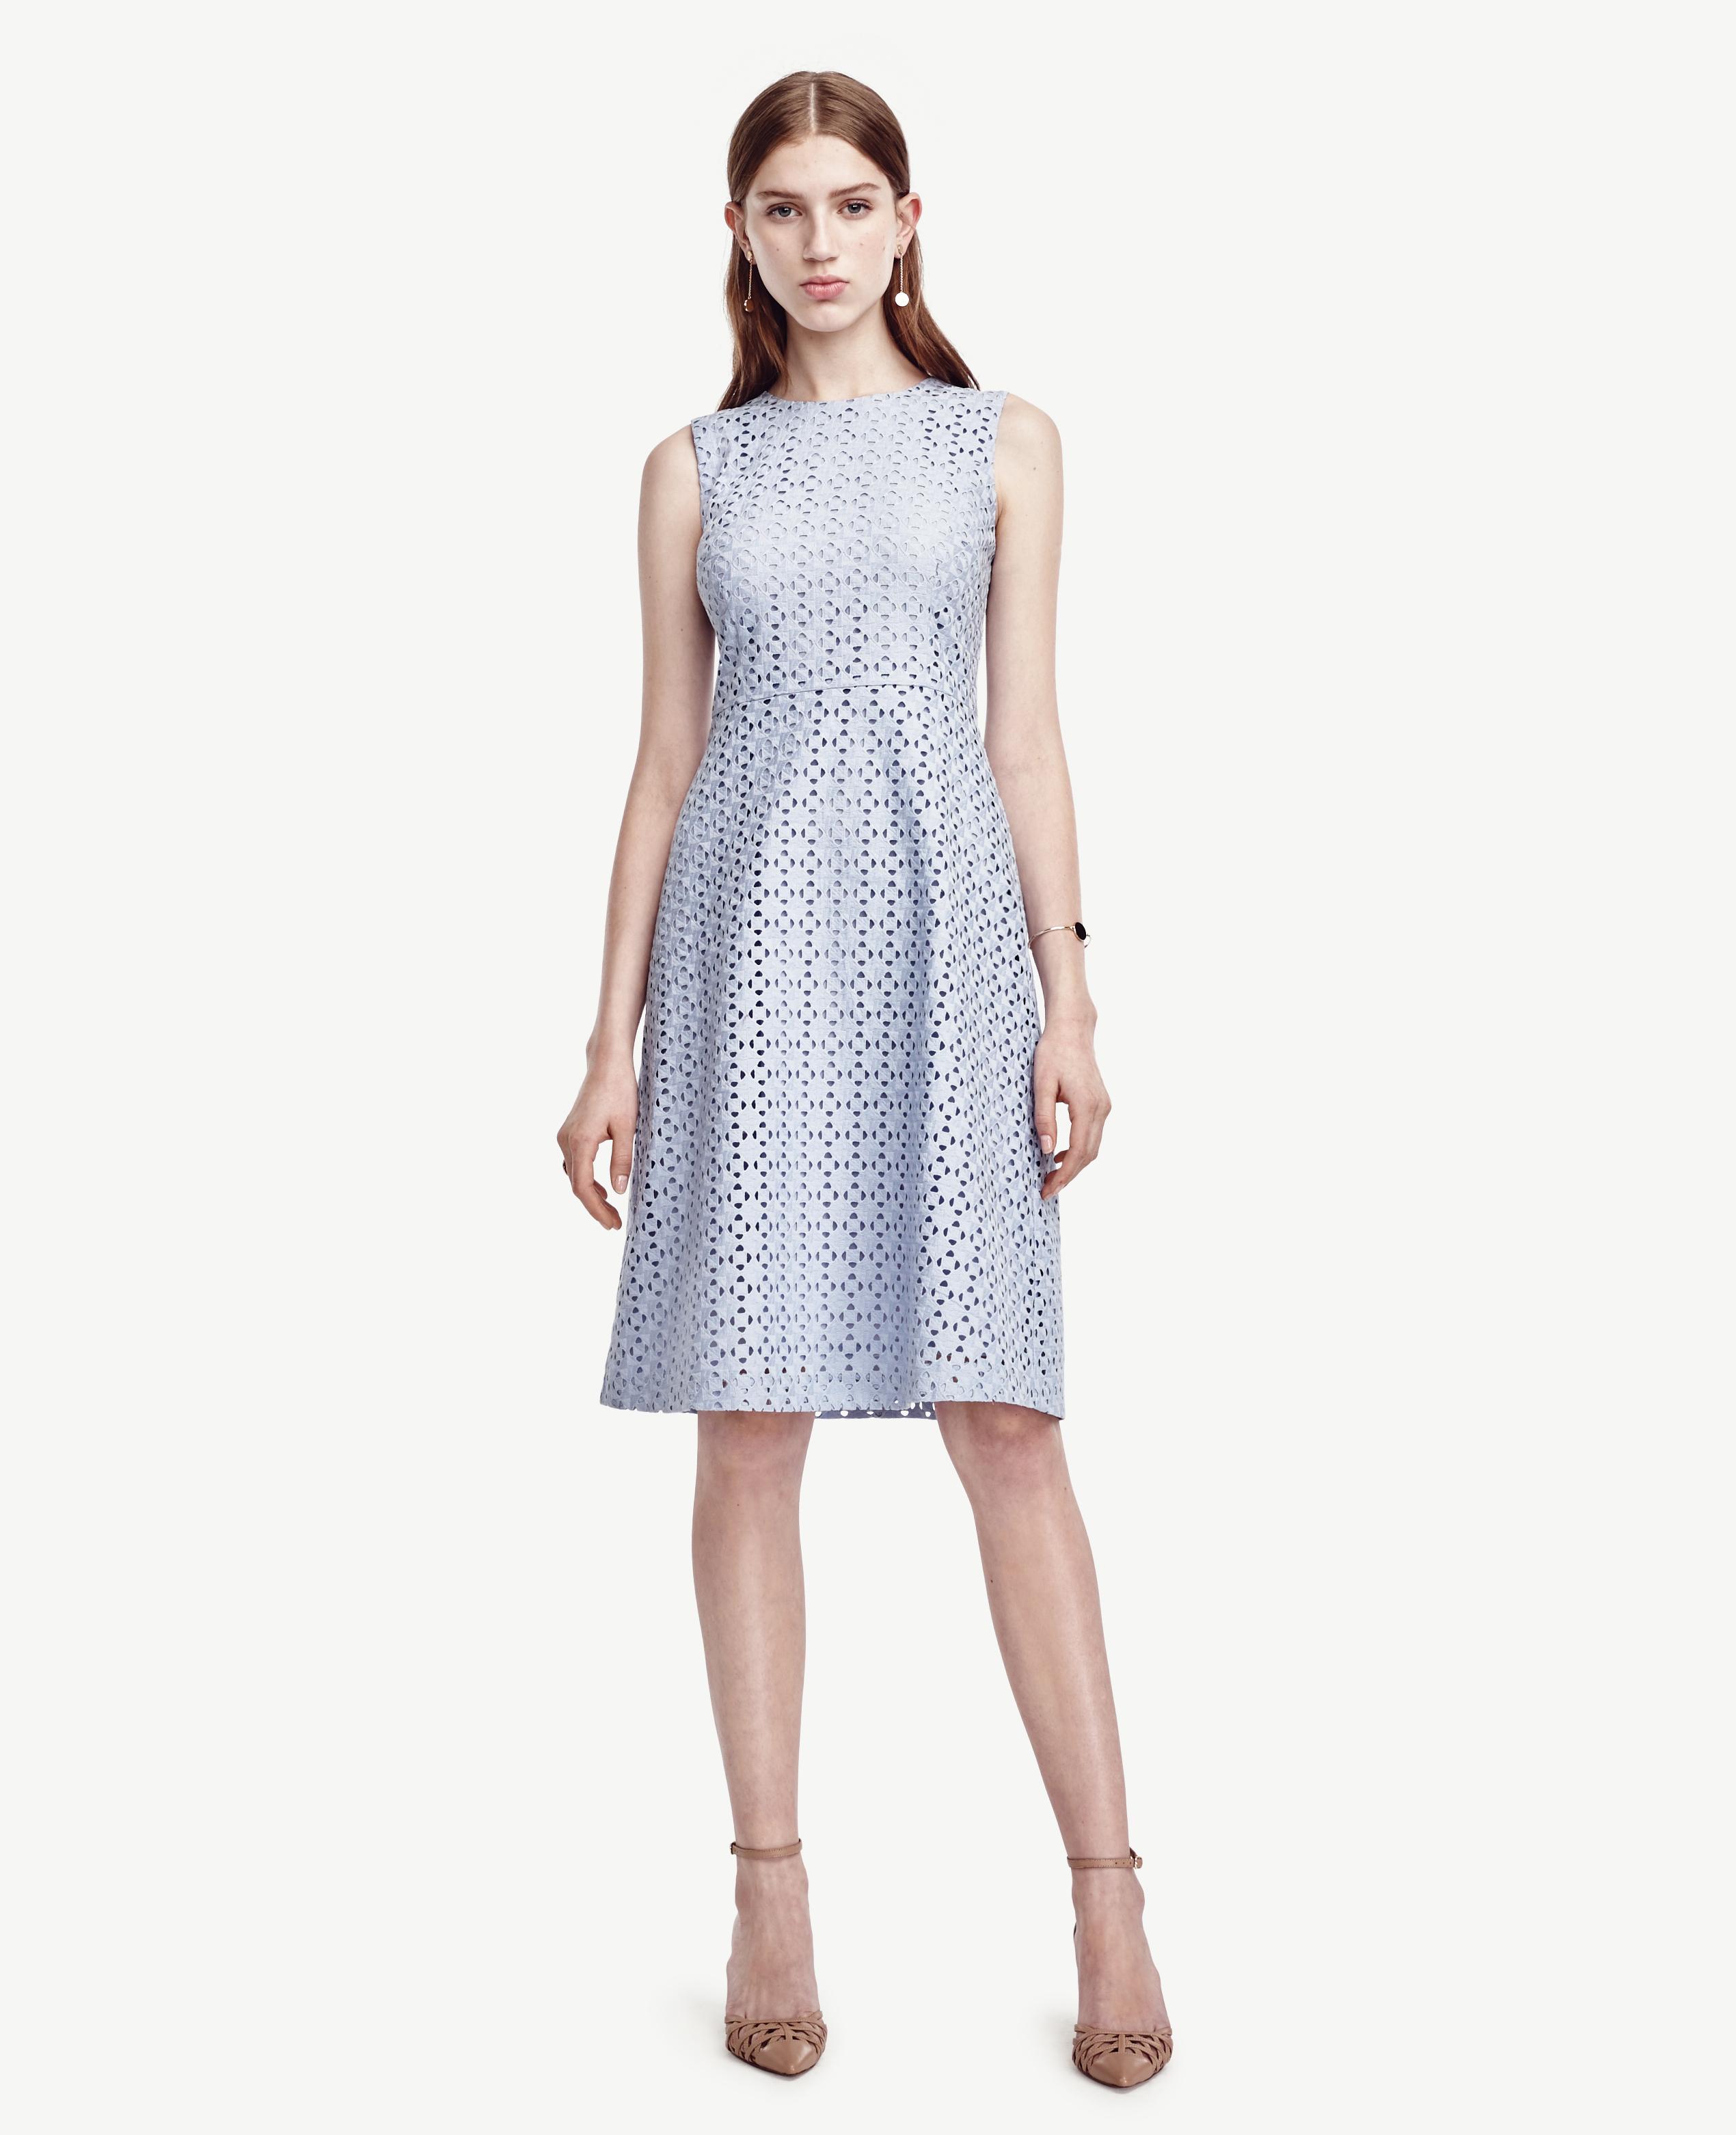 d5ef7f04456c8d Ann Taylor Petite Eyelet Flare Dress in Blue - Lyst